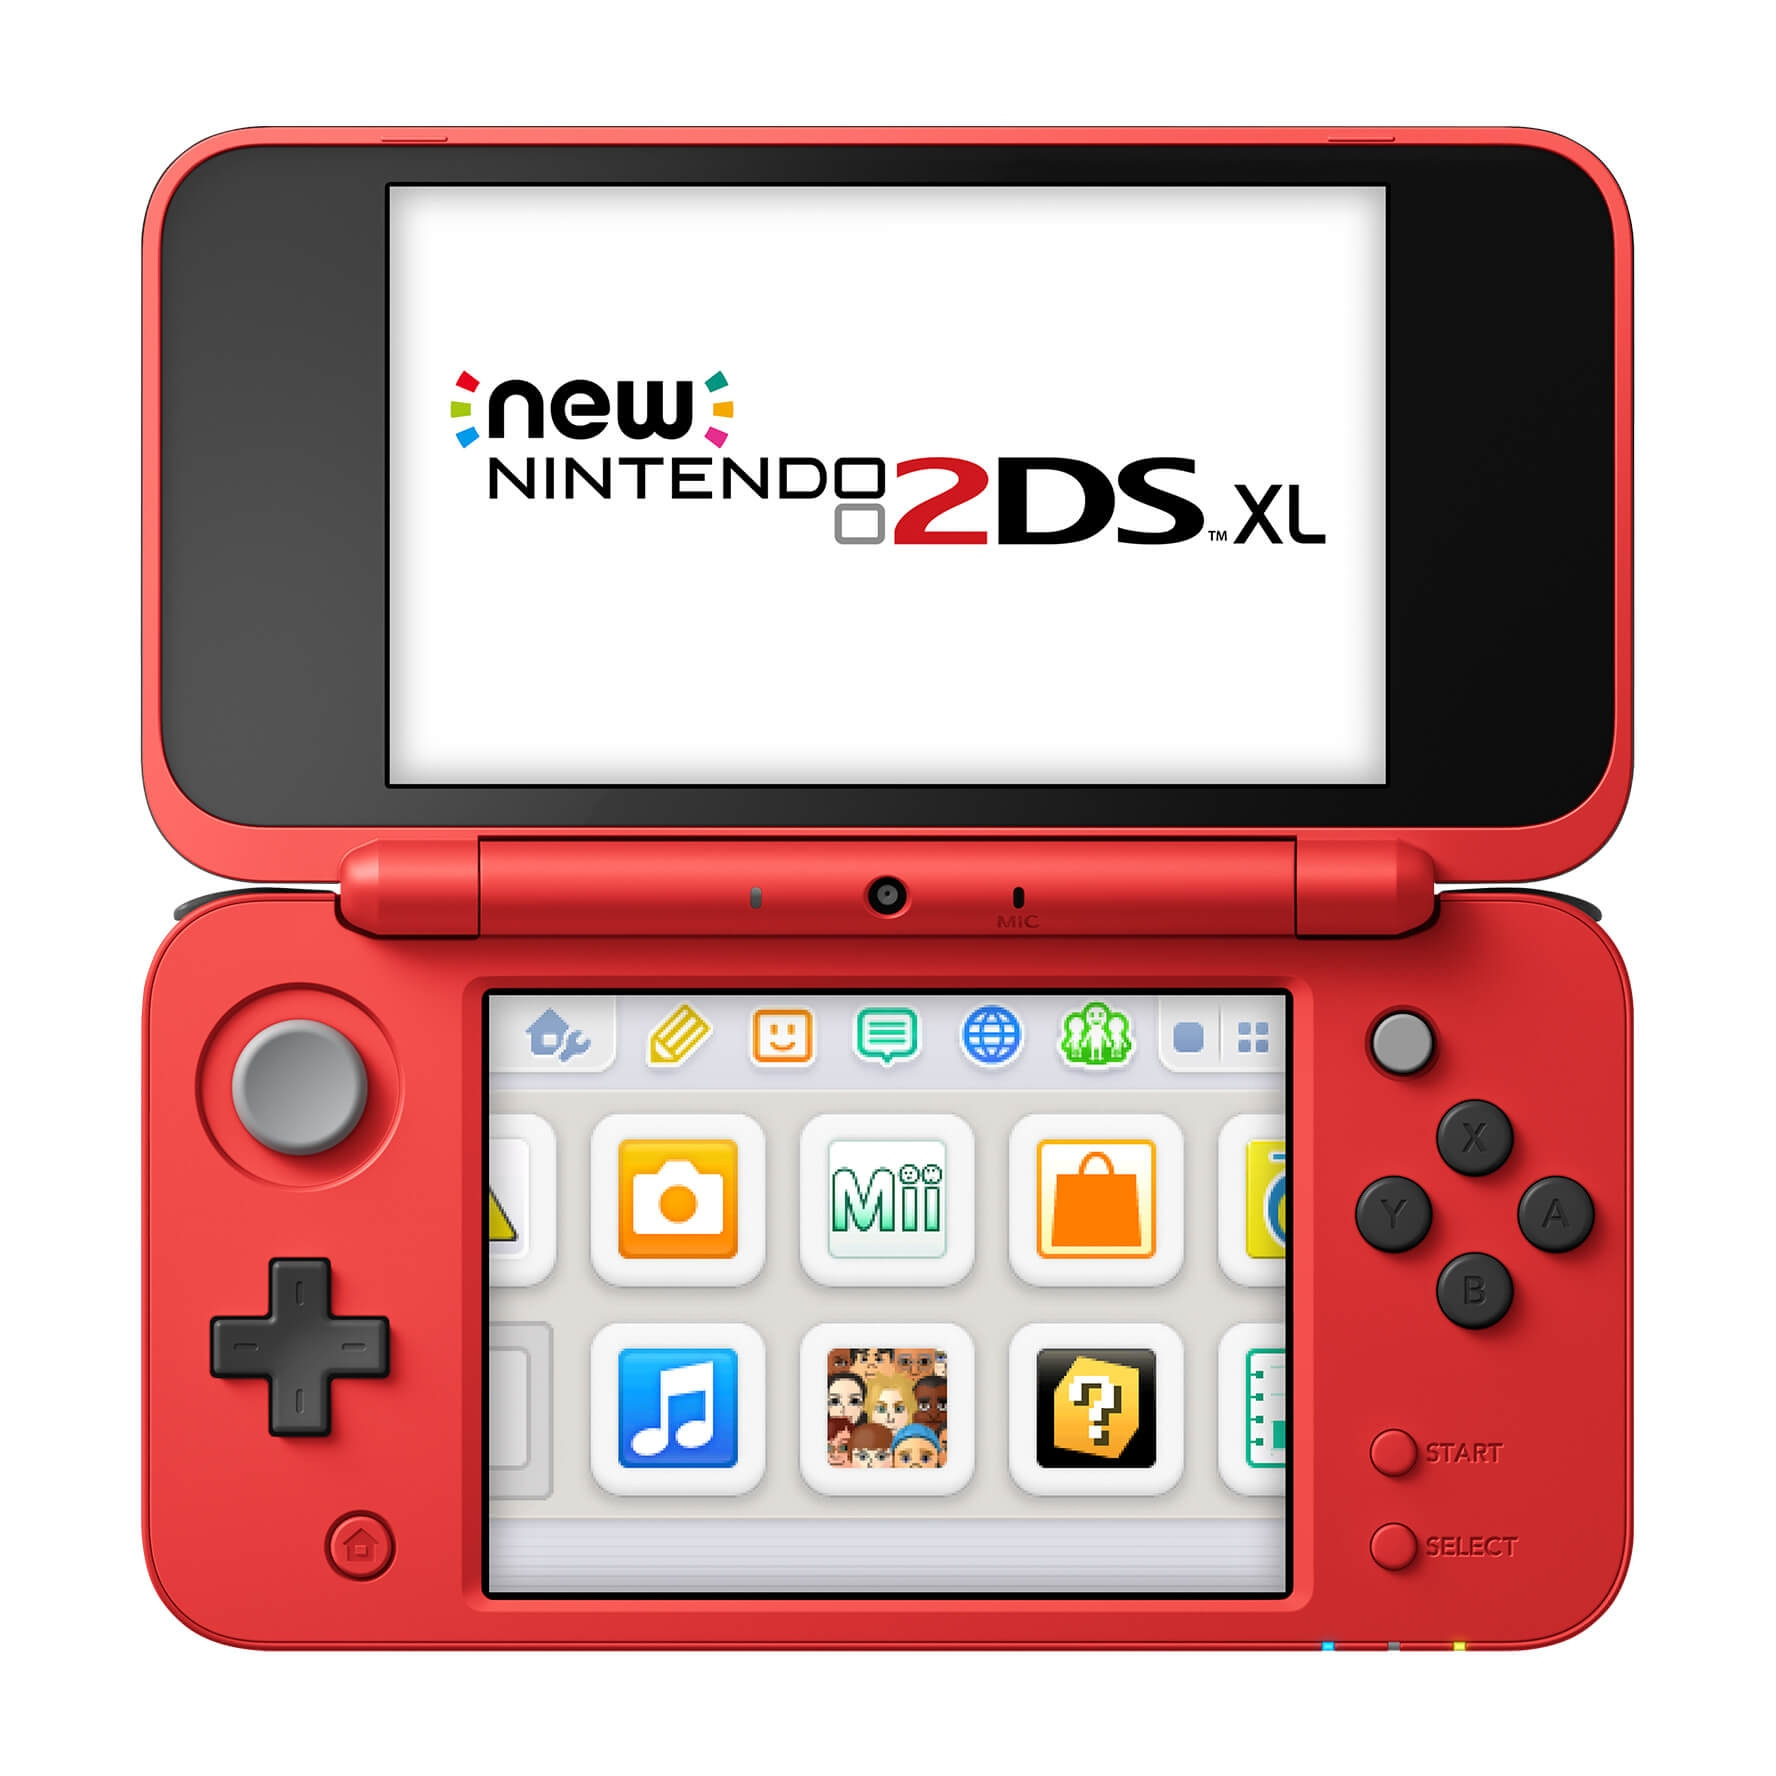 New Nintendo 2DS XL Pokéball.2209666 - 2ds - Bøger -  - 0045496504670 -